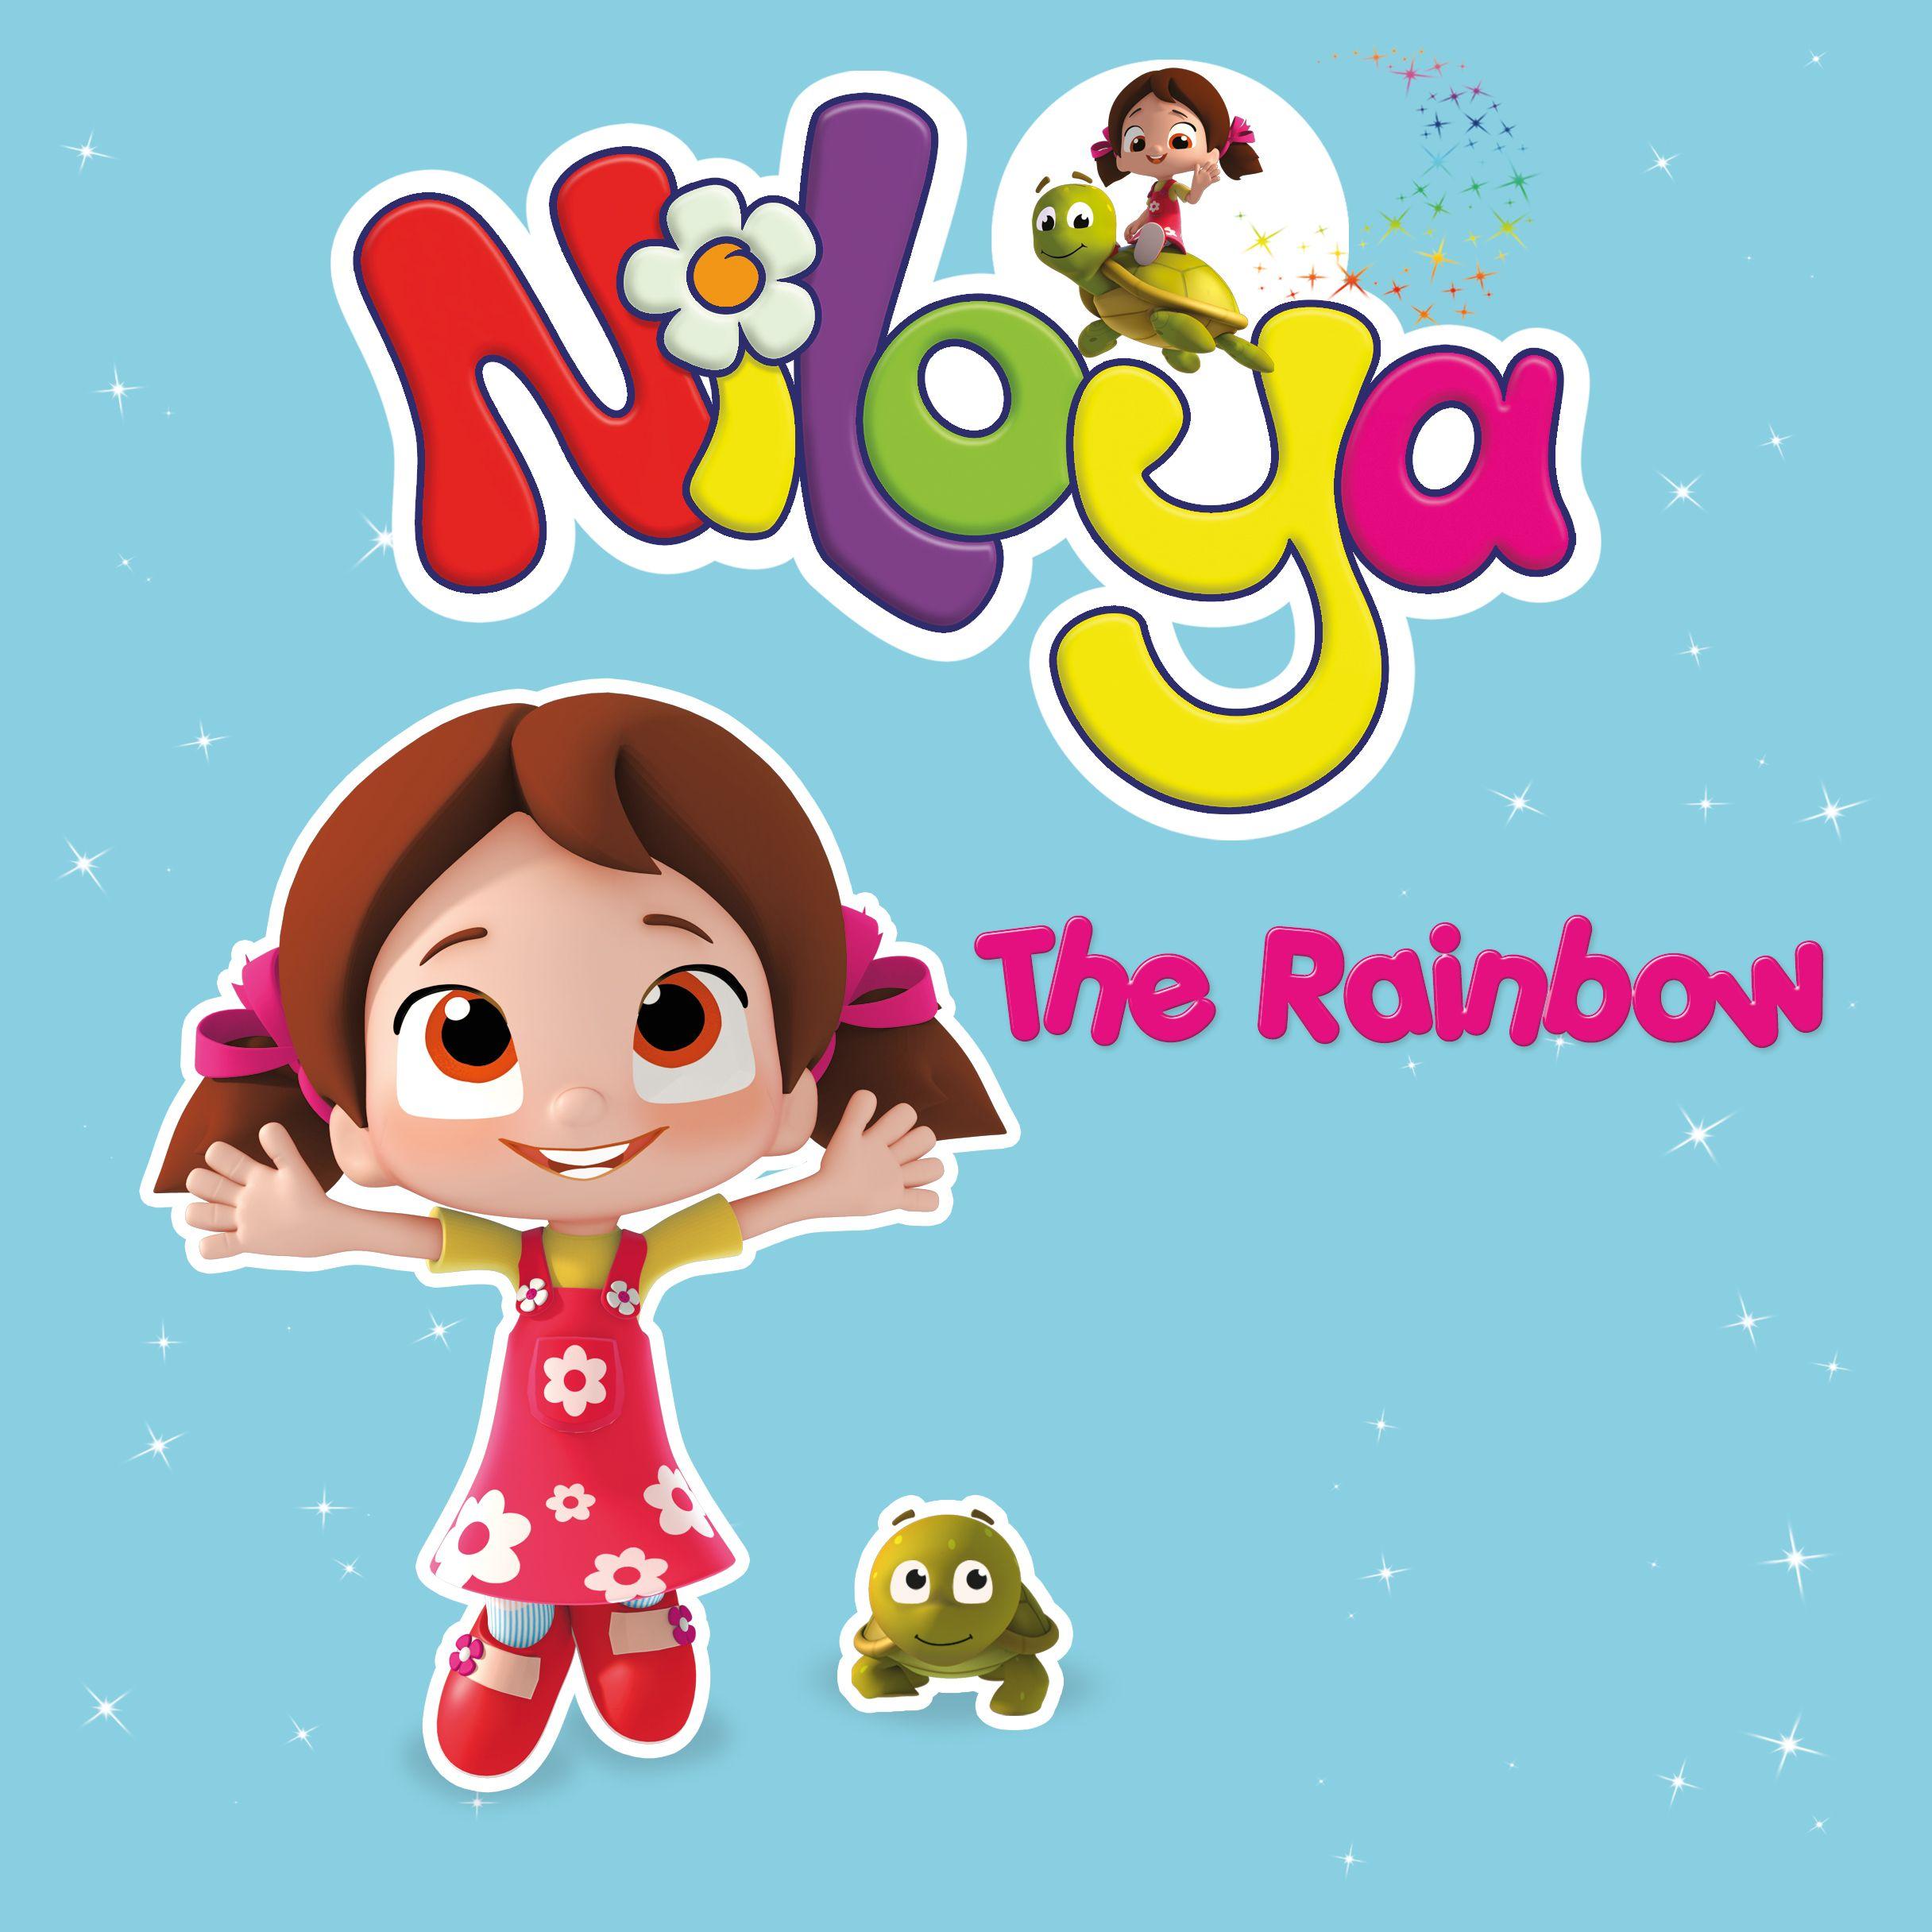 Buy On Amazon Http Www Amazon Com Rainbow Niloya Zambak Cucok Publishing Dp 1462118623 The Rainbow Niloya 1 Ni Pet Turtle Rainbow Fish School Projects